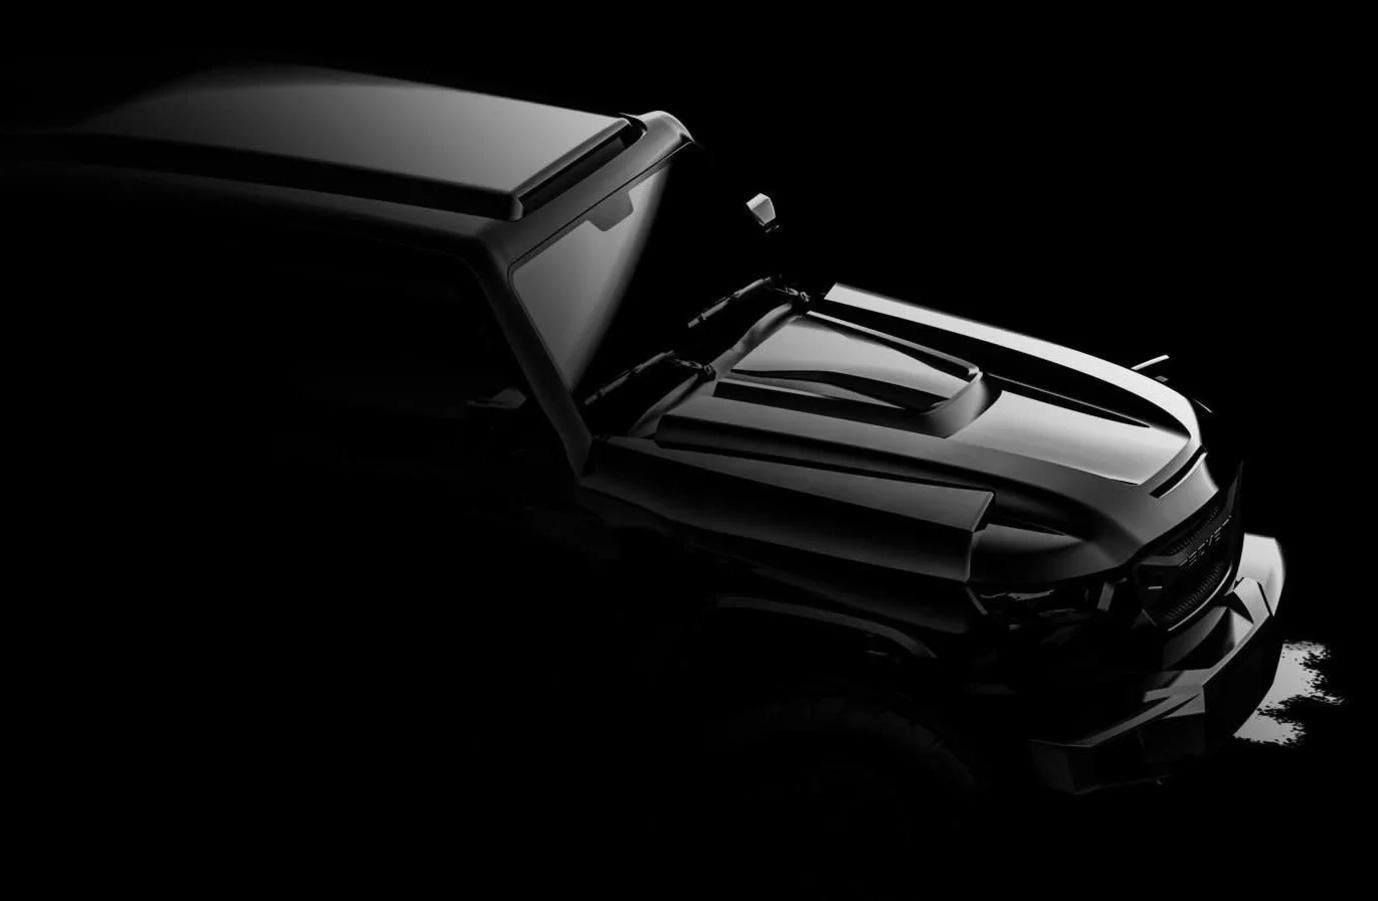 Revzani Unveils 1,000 Horsepower 2020 Tank SUV at werd.com